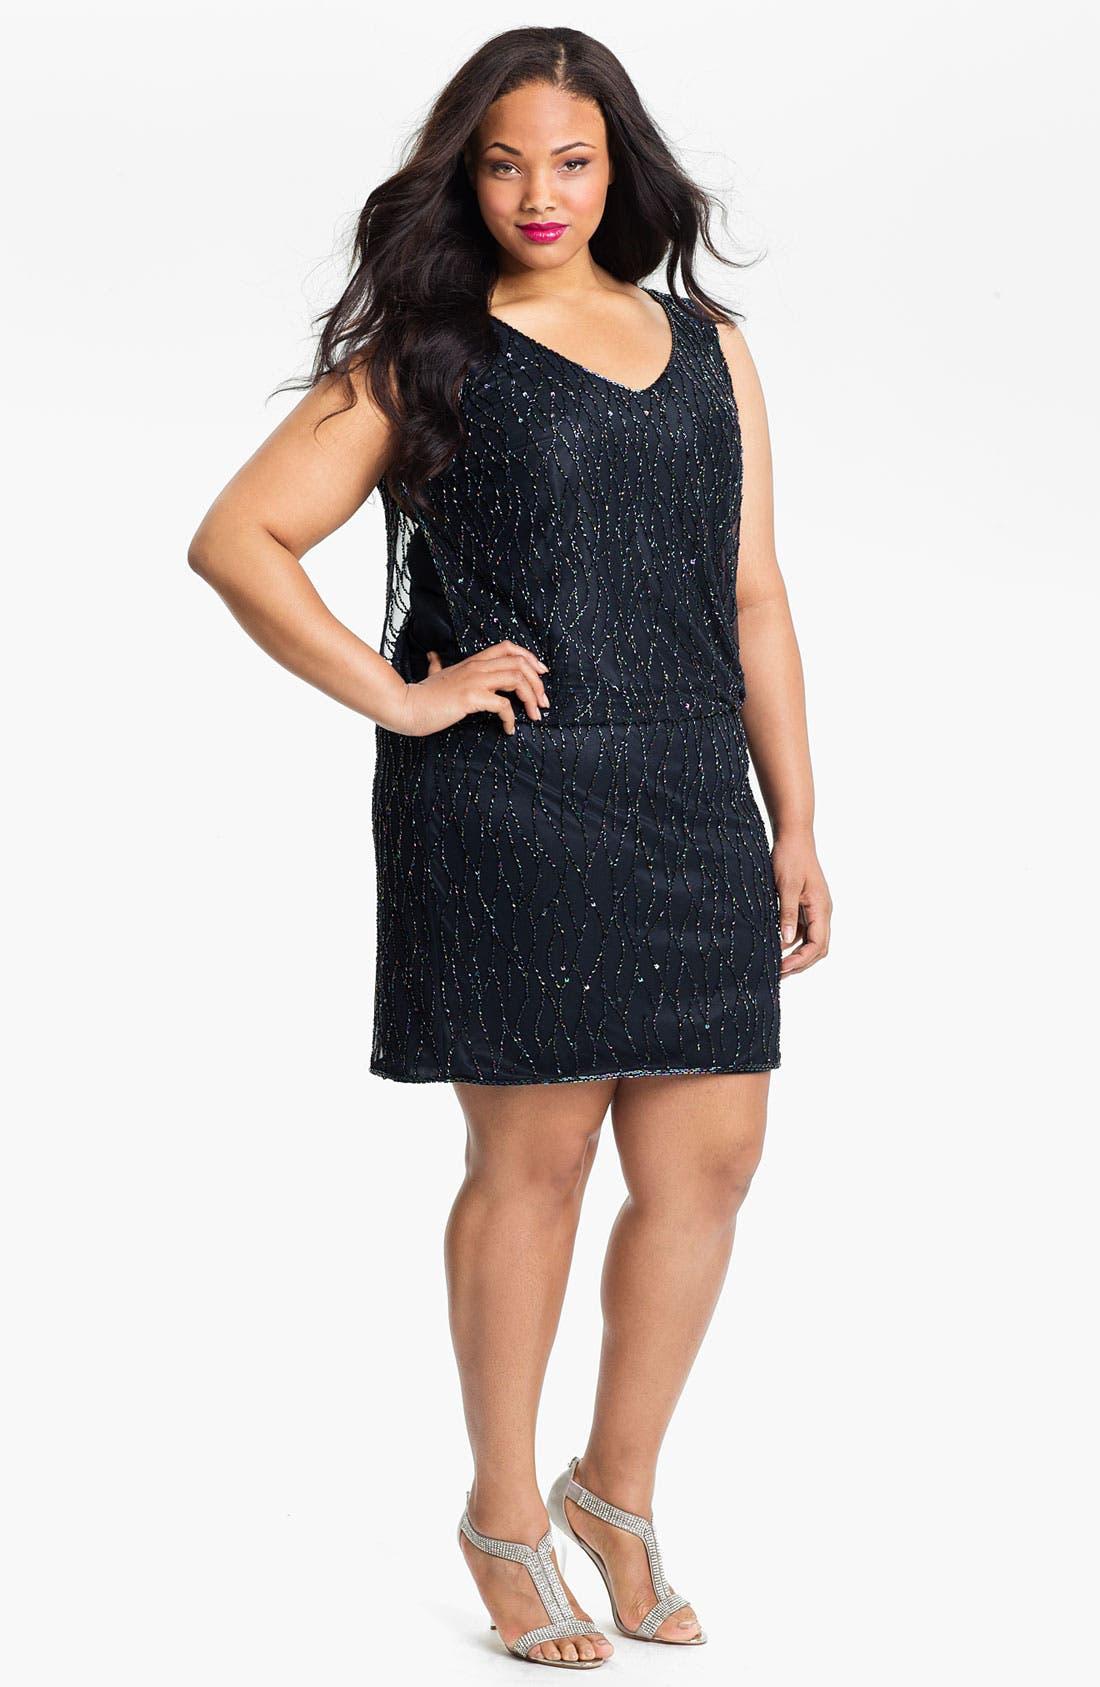 Alternate Image 1 Selected - J Kara Sleeveless Beaded Blouson Dress (Plus)